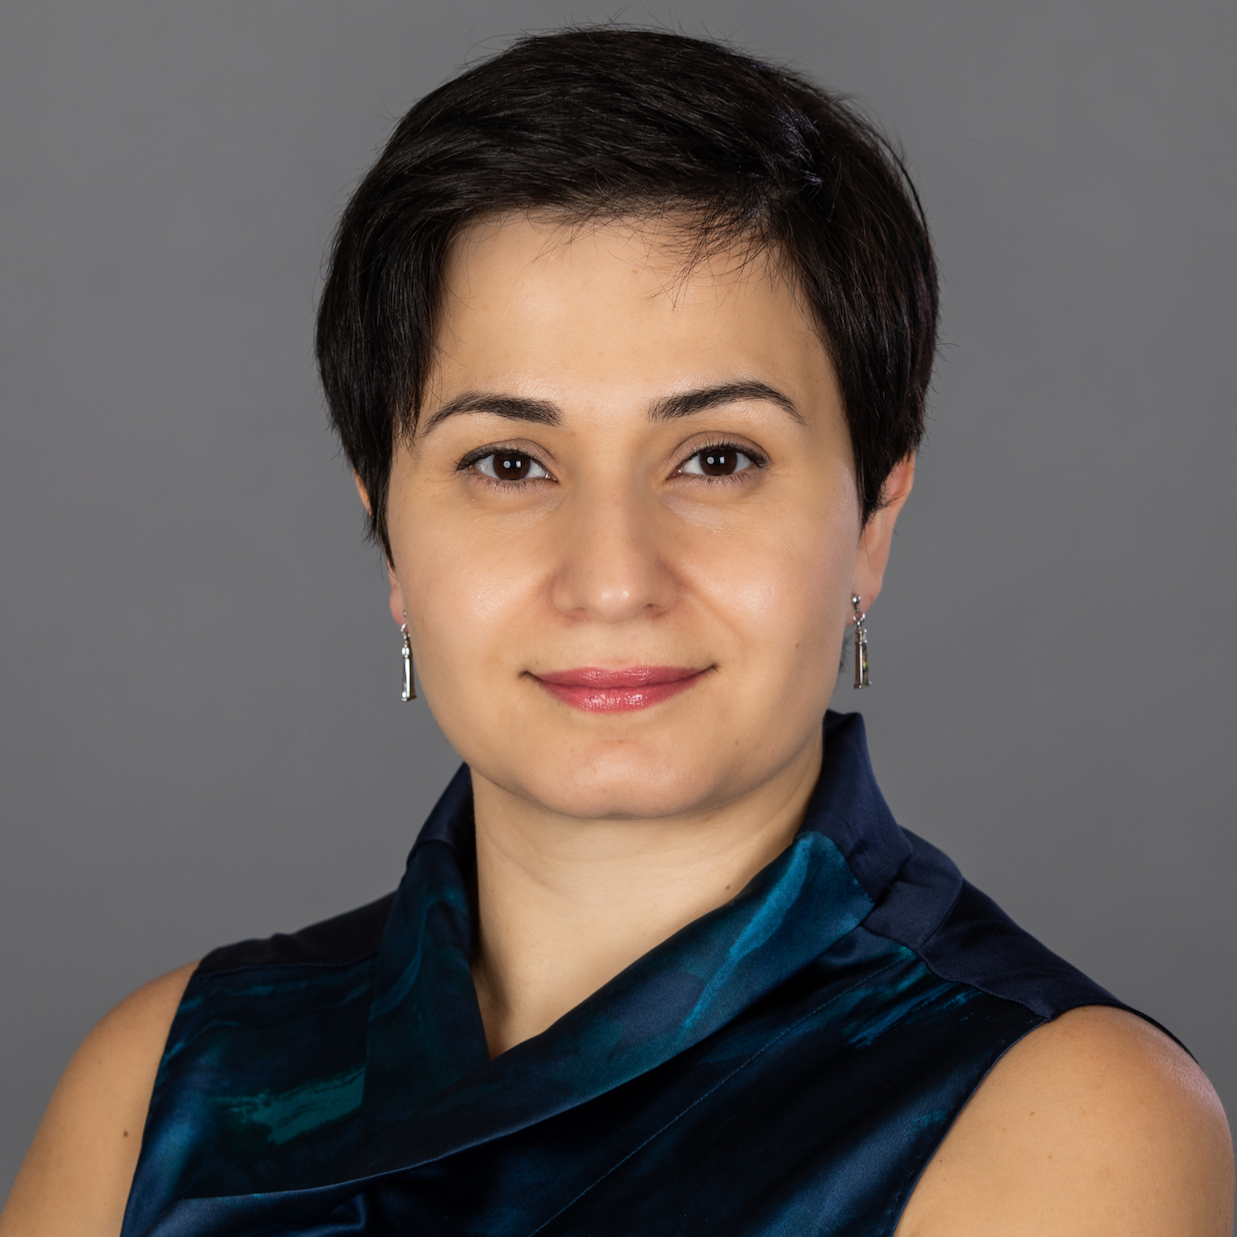 Dr. Marine Lipartia, MD photo#0